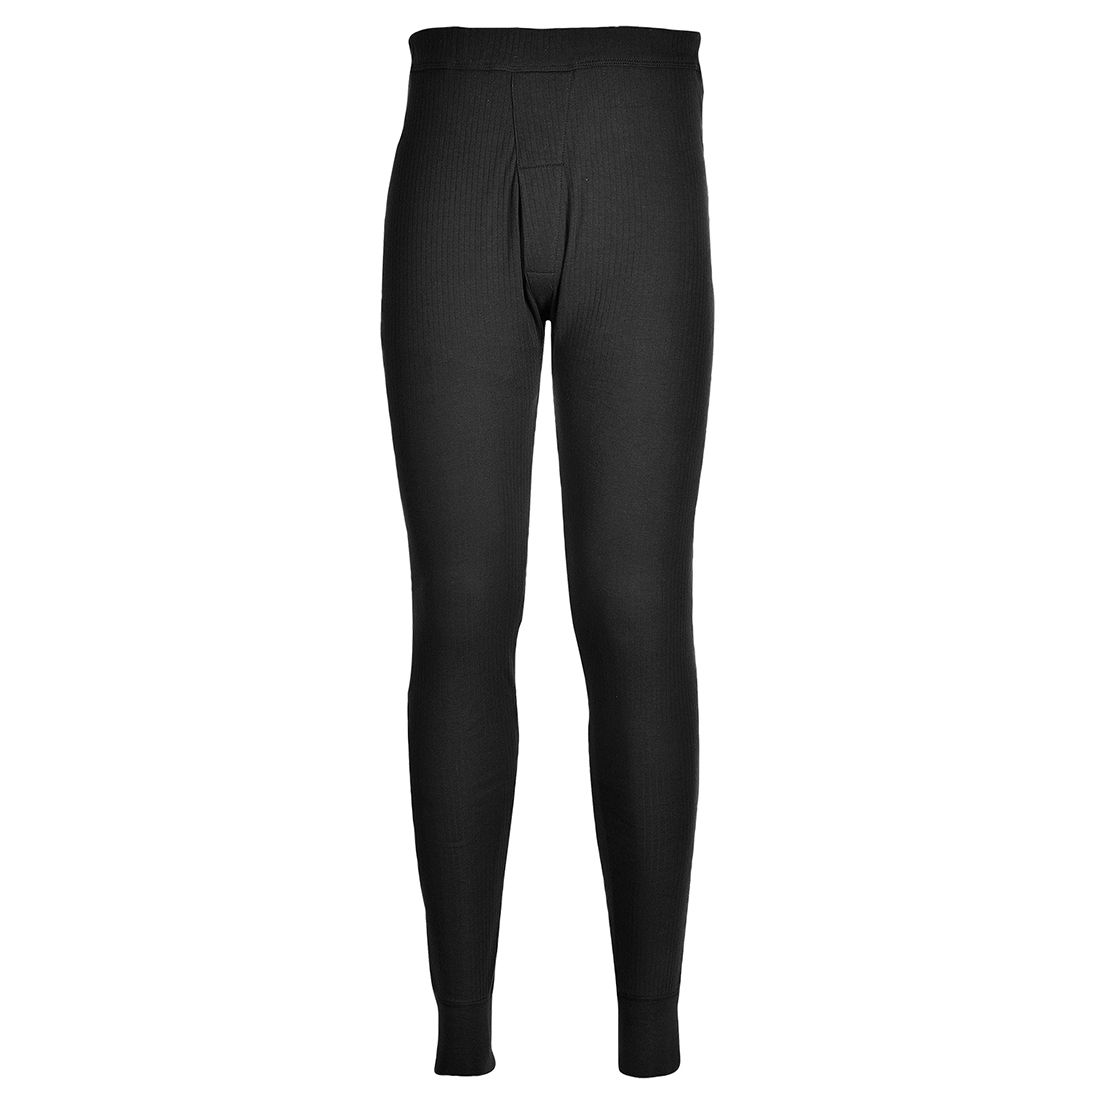 Thermal Trousers Black XXLR